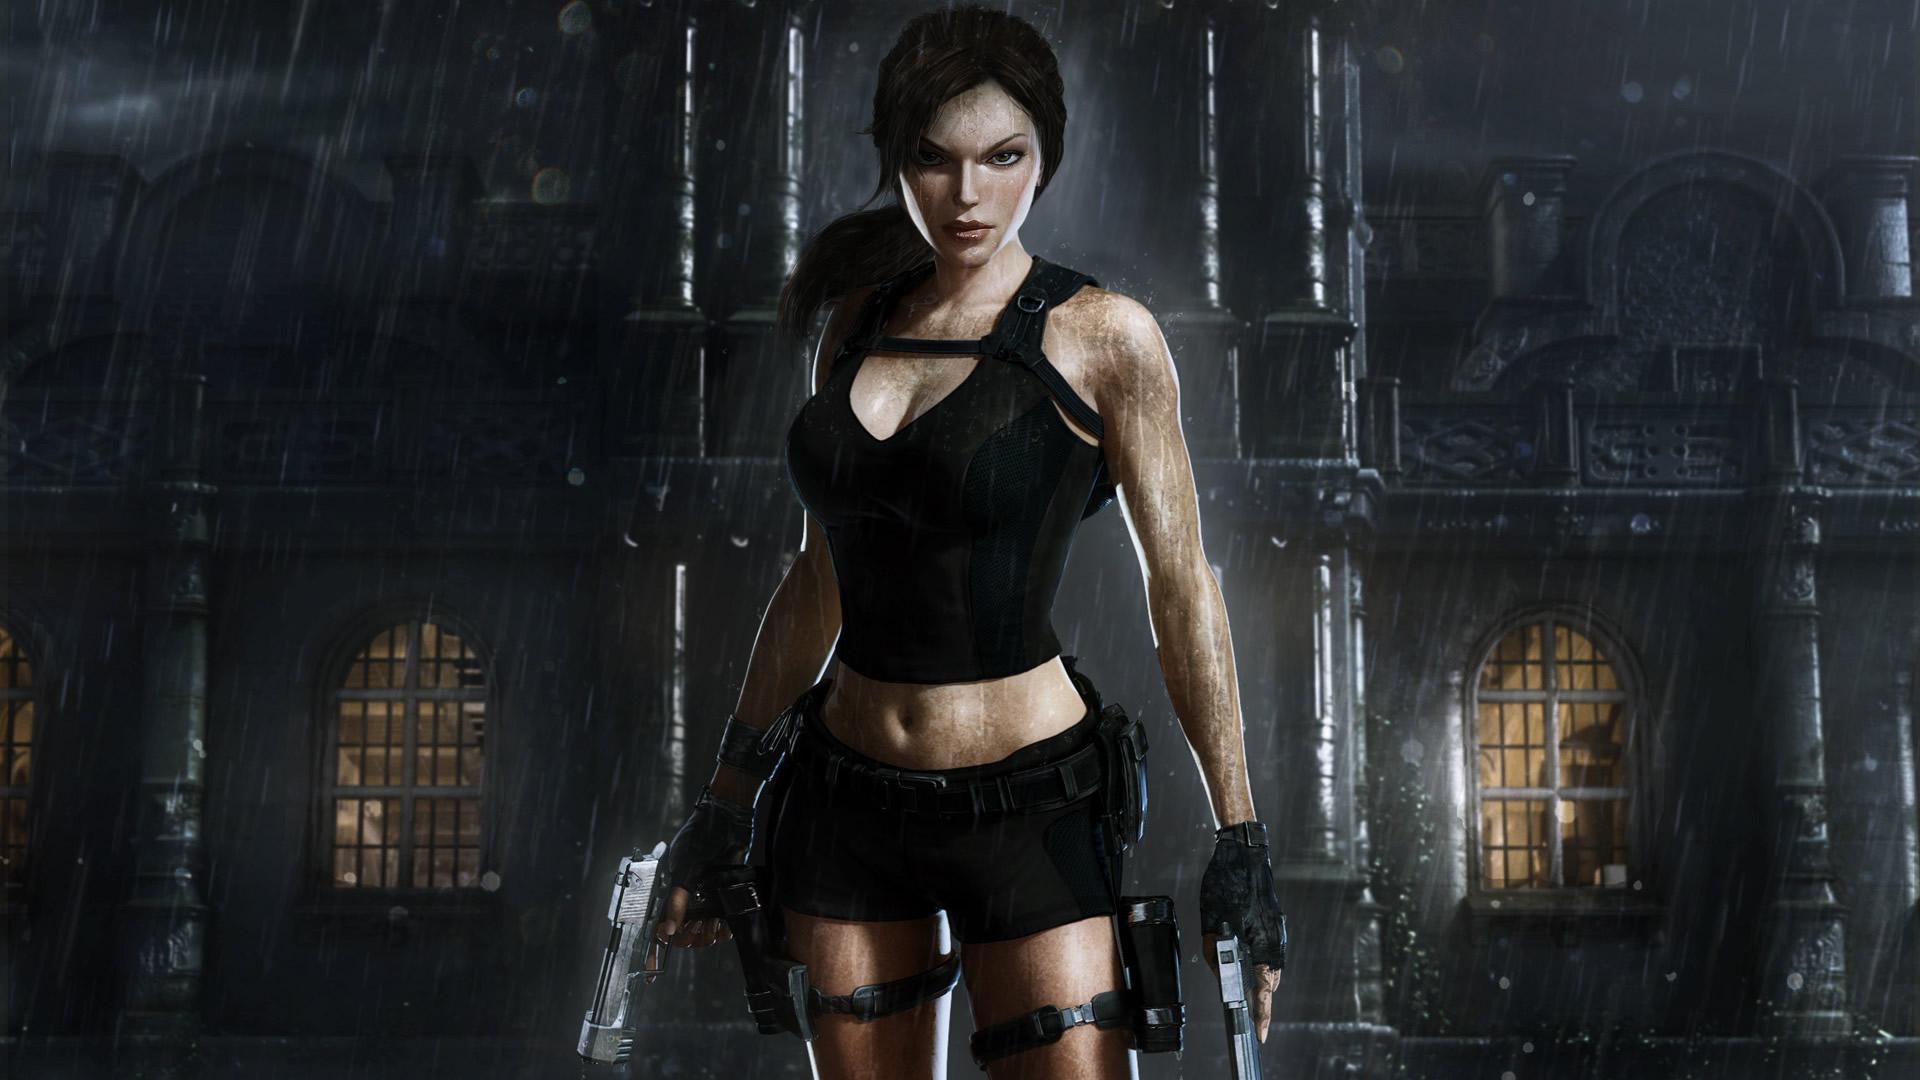 Magnificent Lara Croft in Tomb Raider Underworld Wallpaper